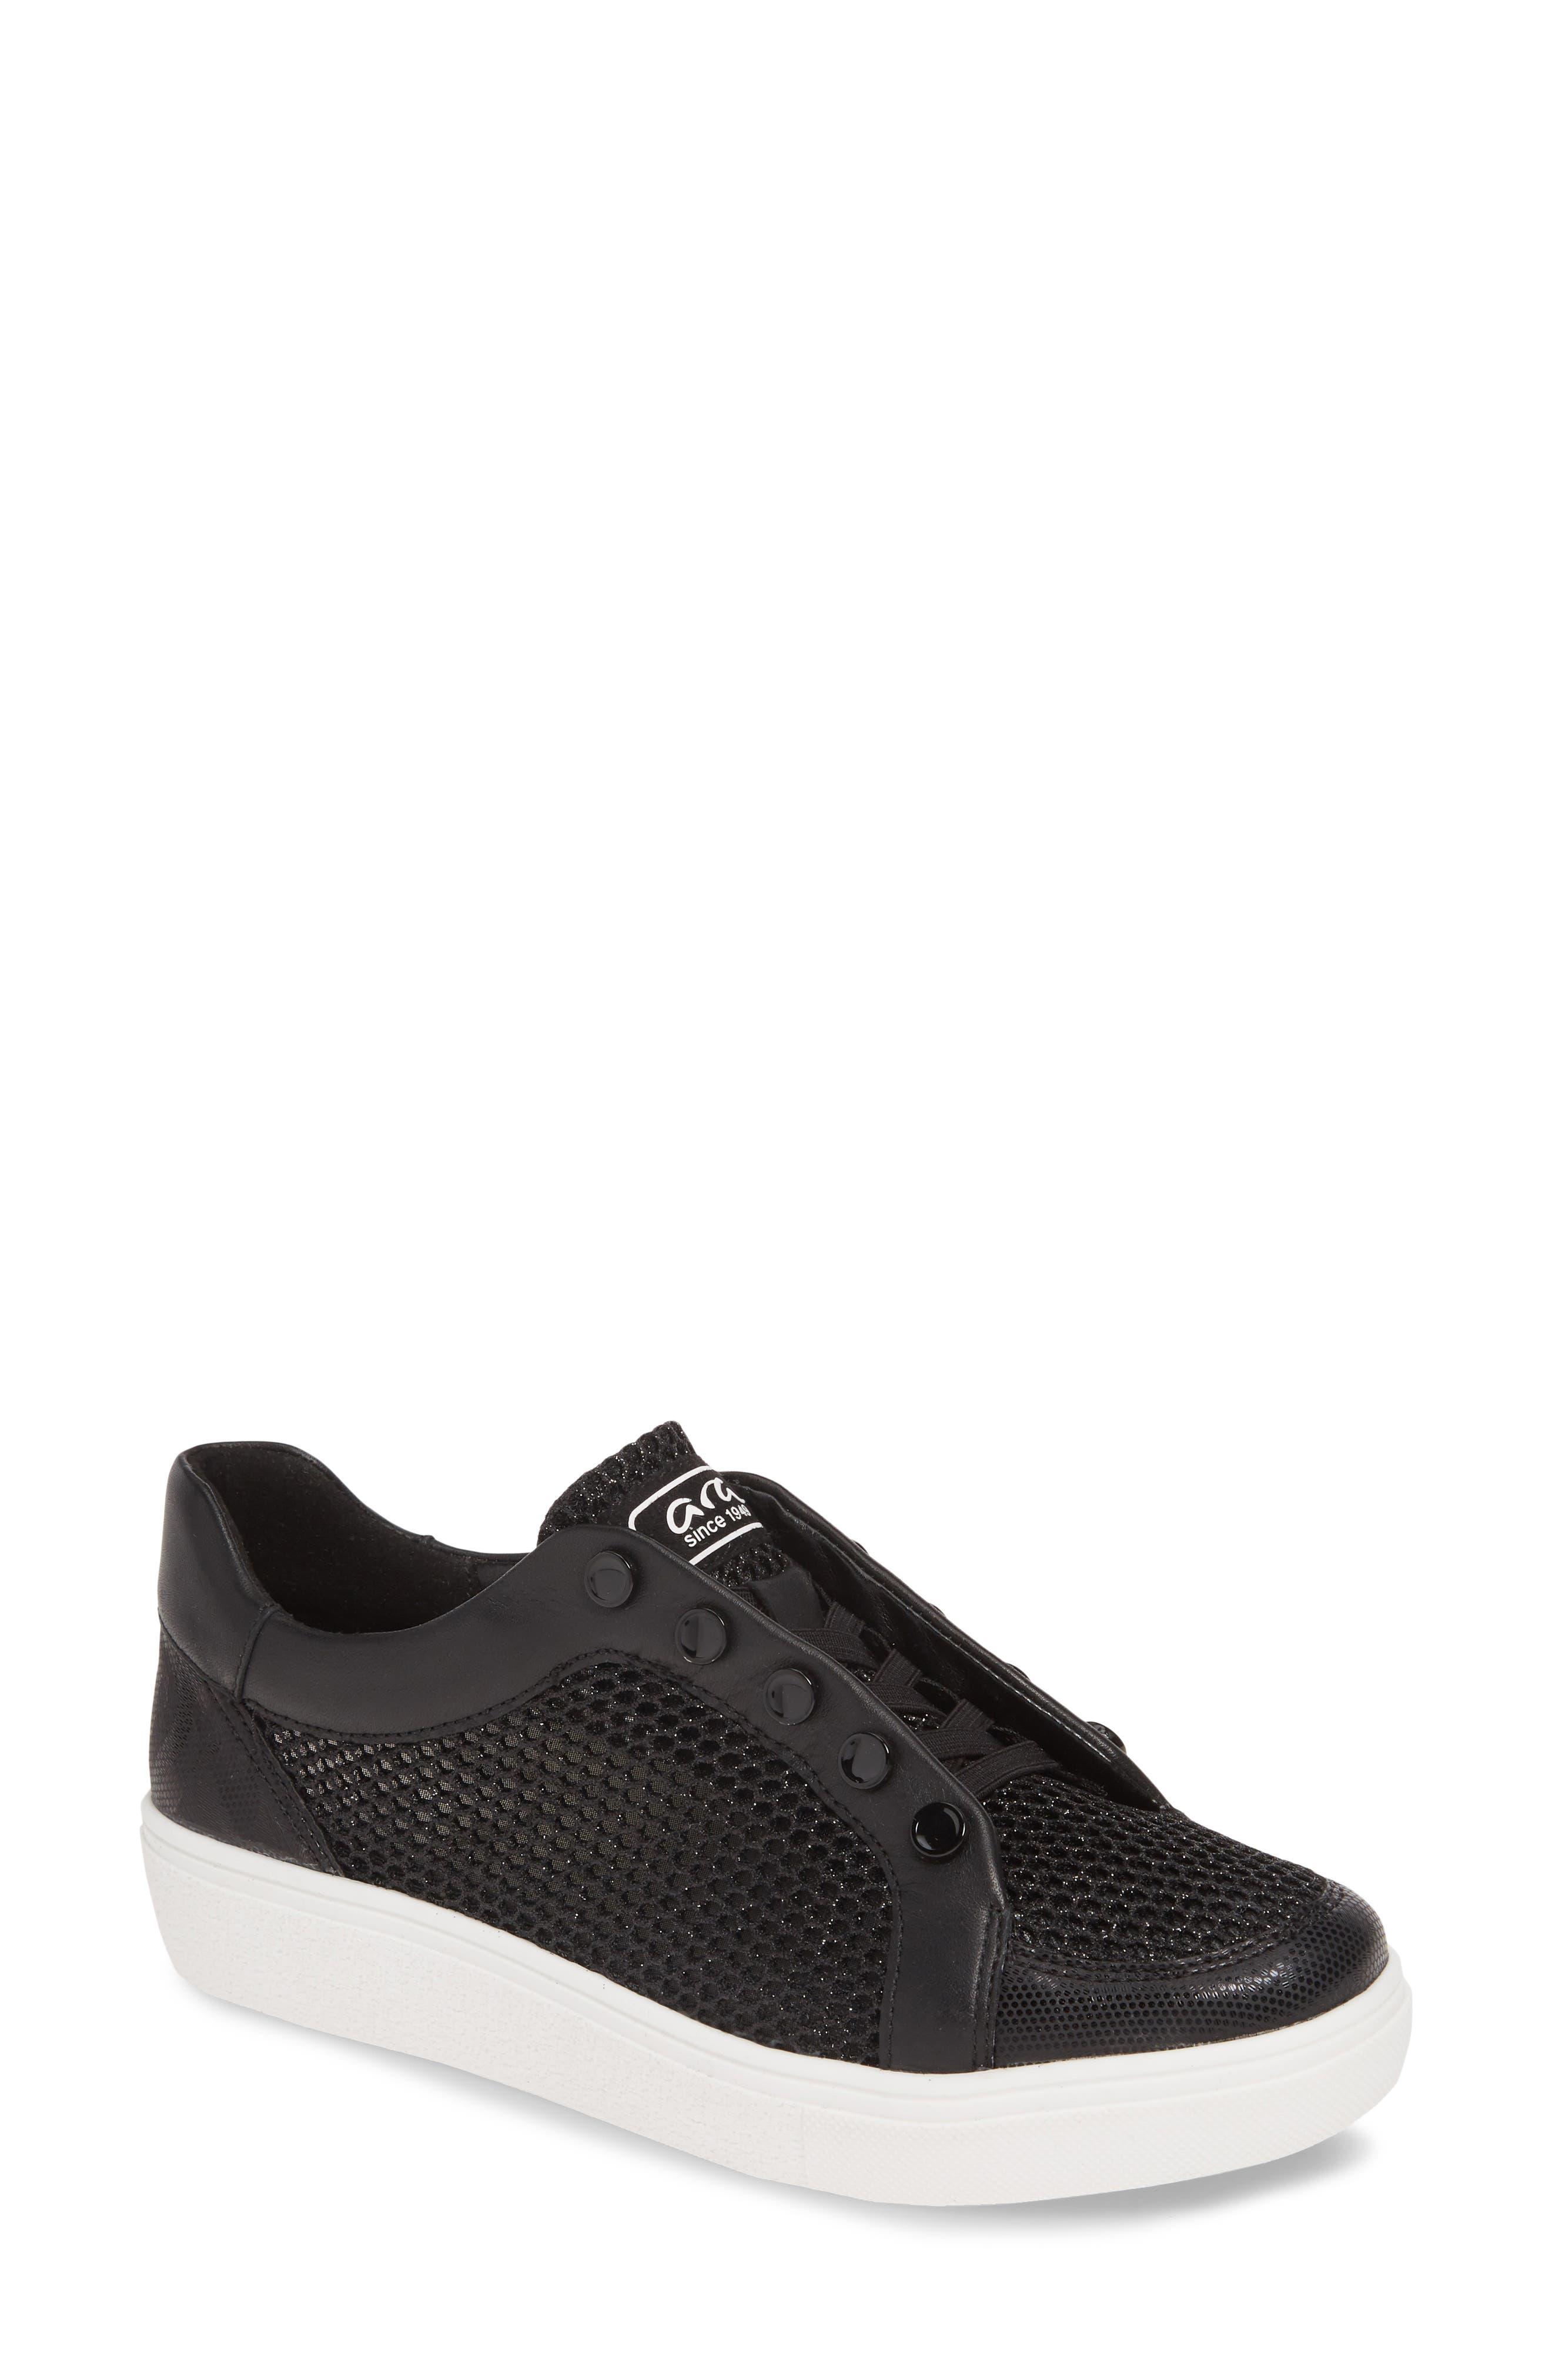 Ara Natasha Slip-On Sneaker- Black